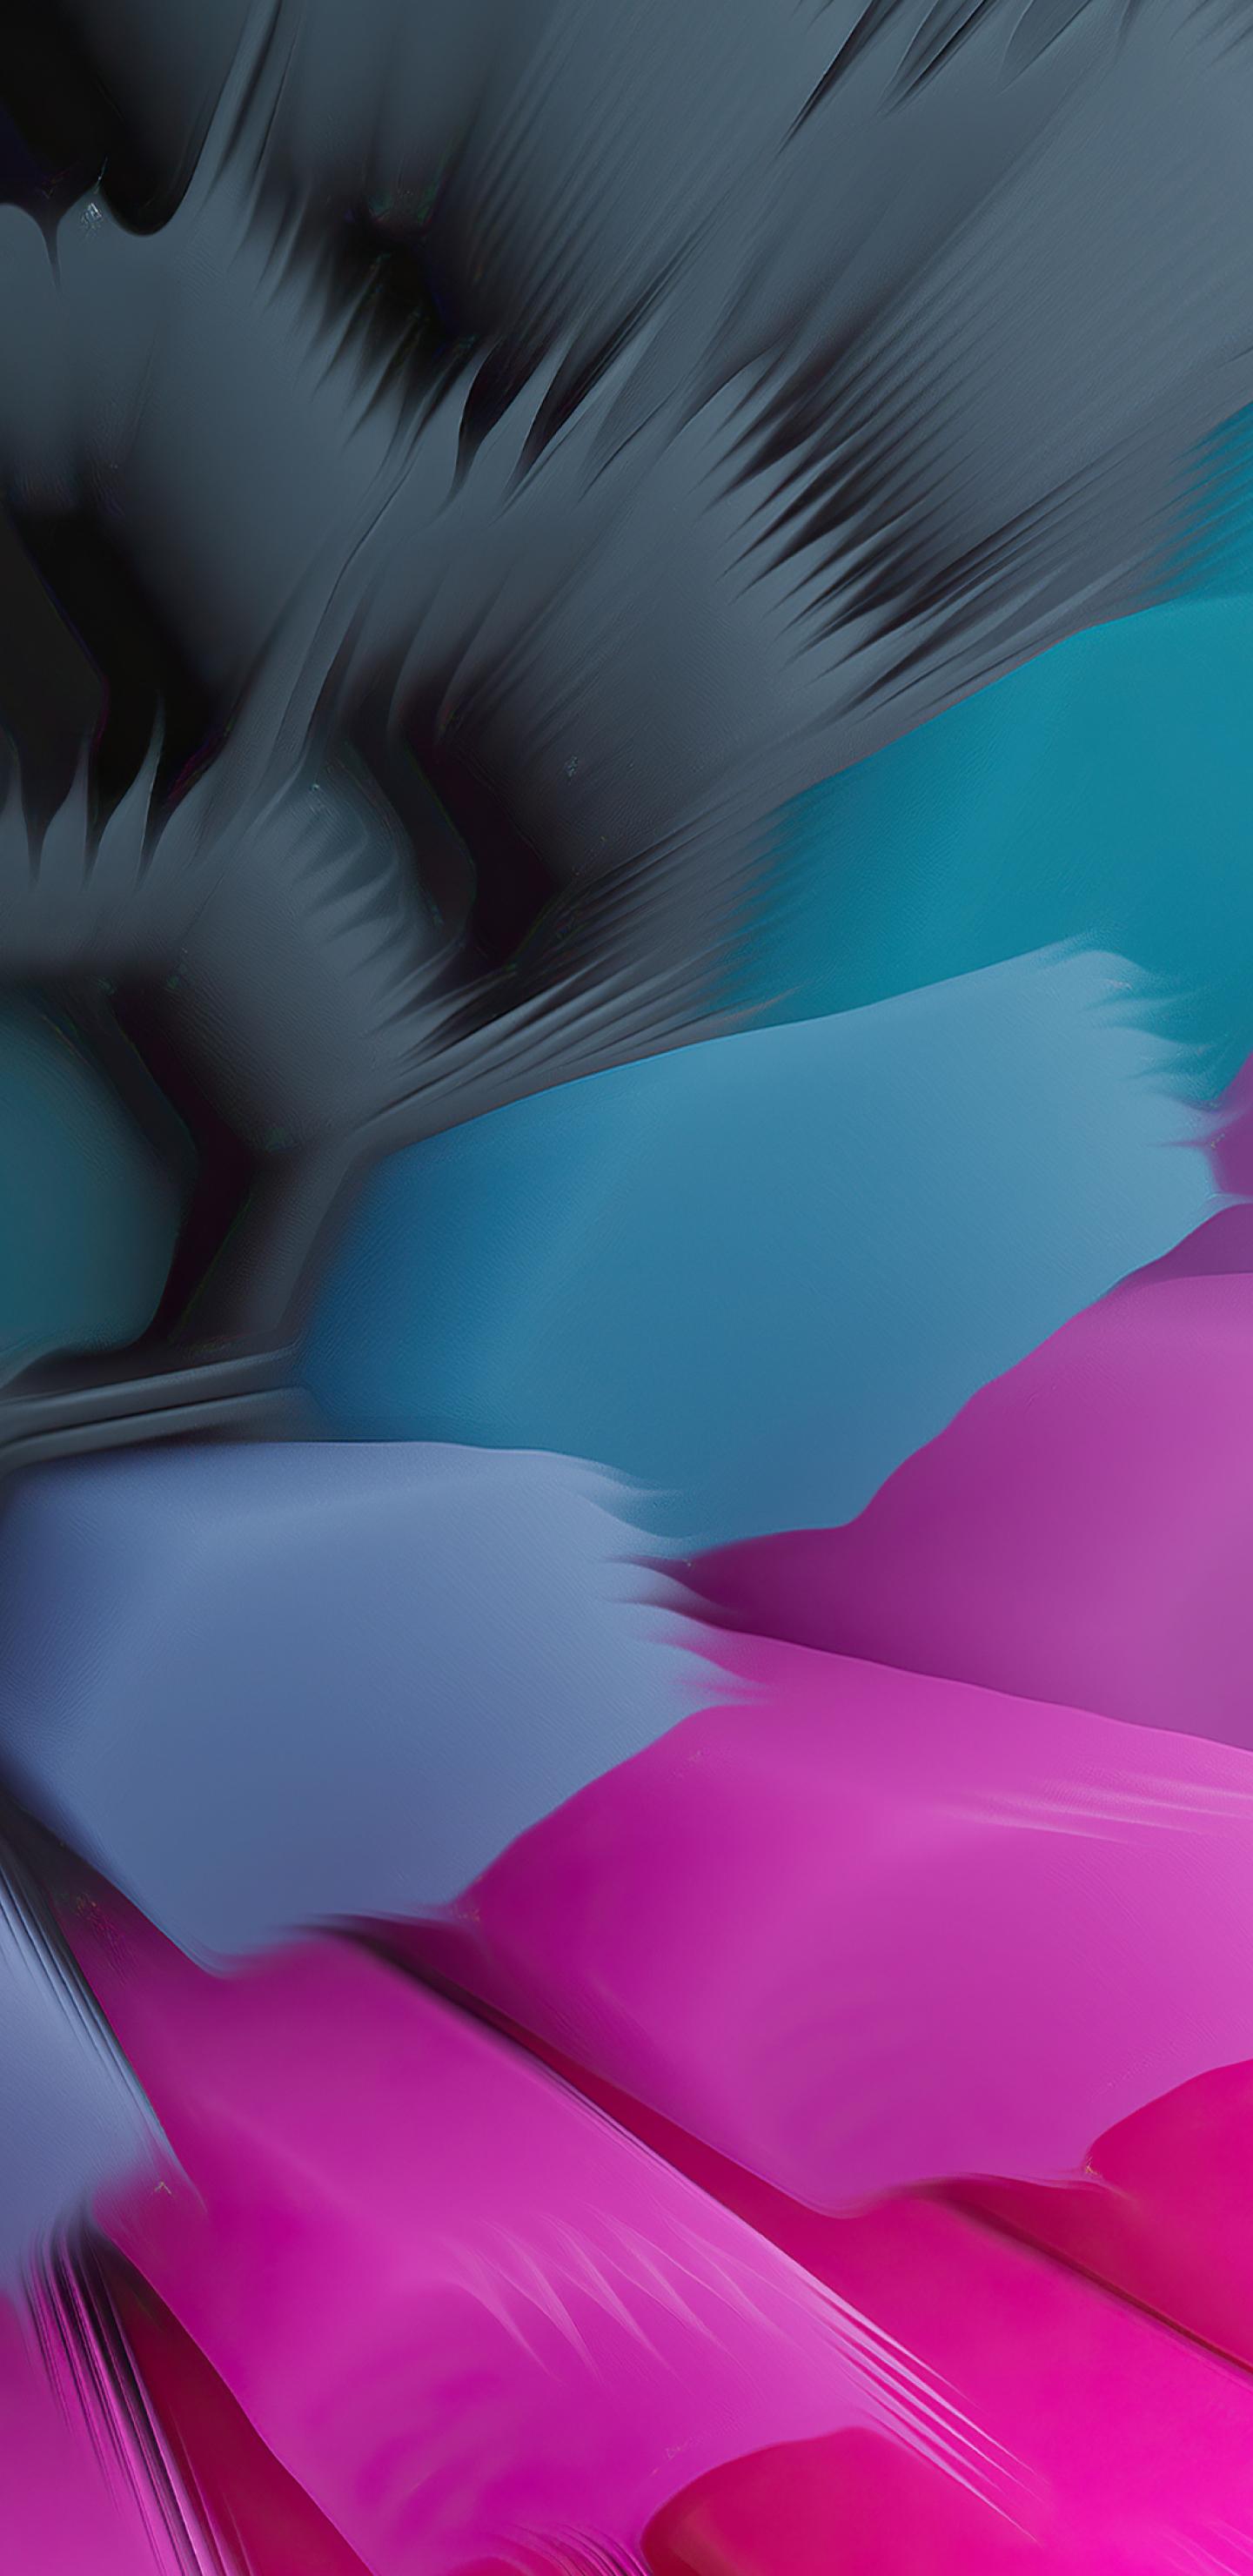 Pink Blue 4K Hexagon Wallpaper in 1440x2960 Resolution